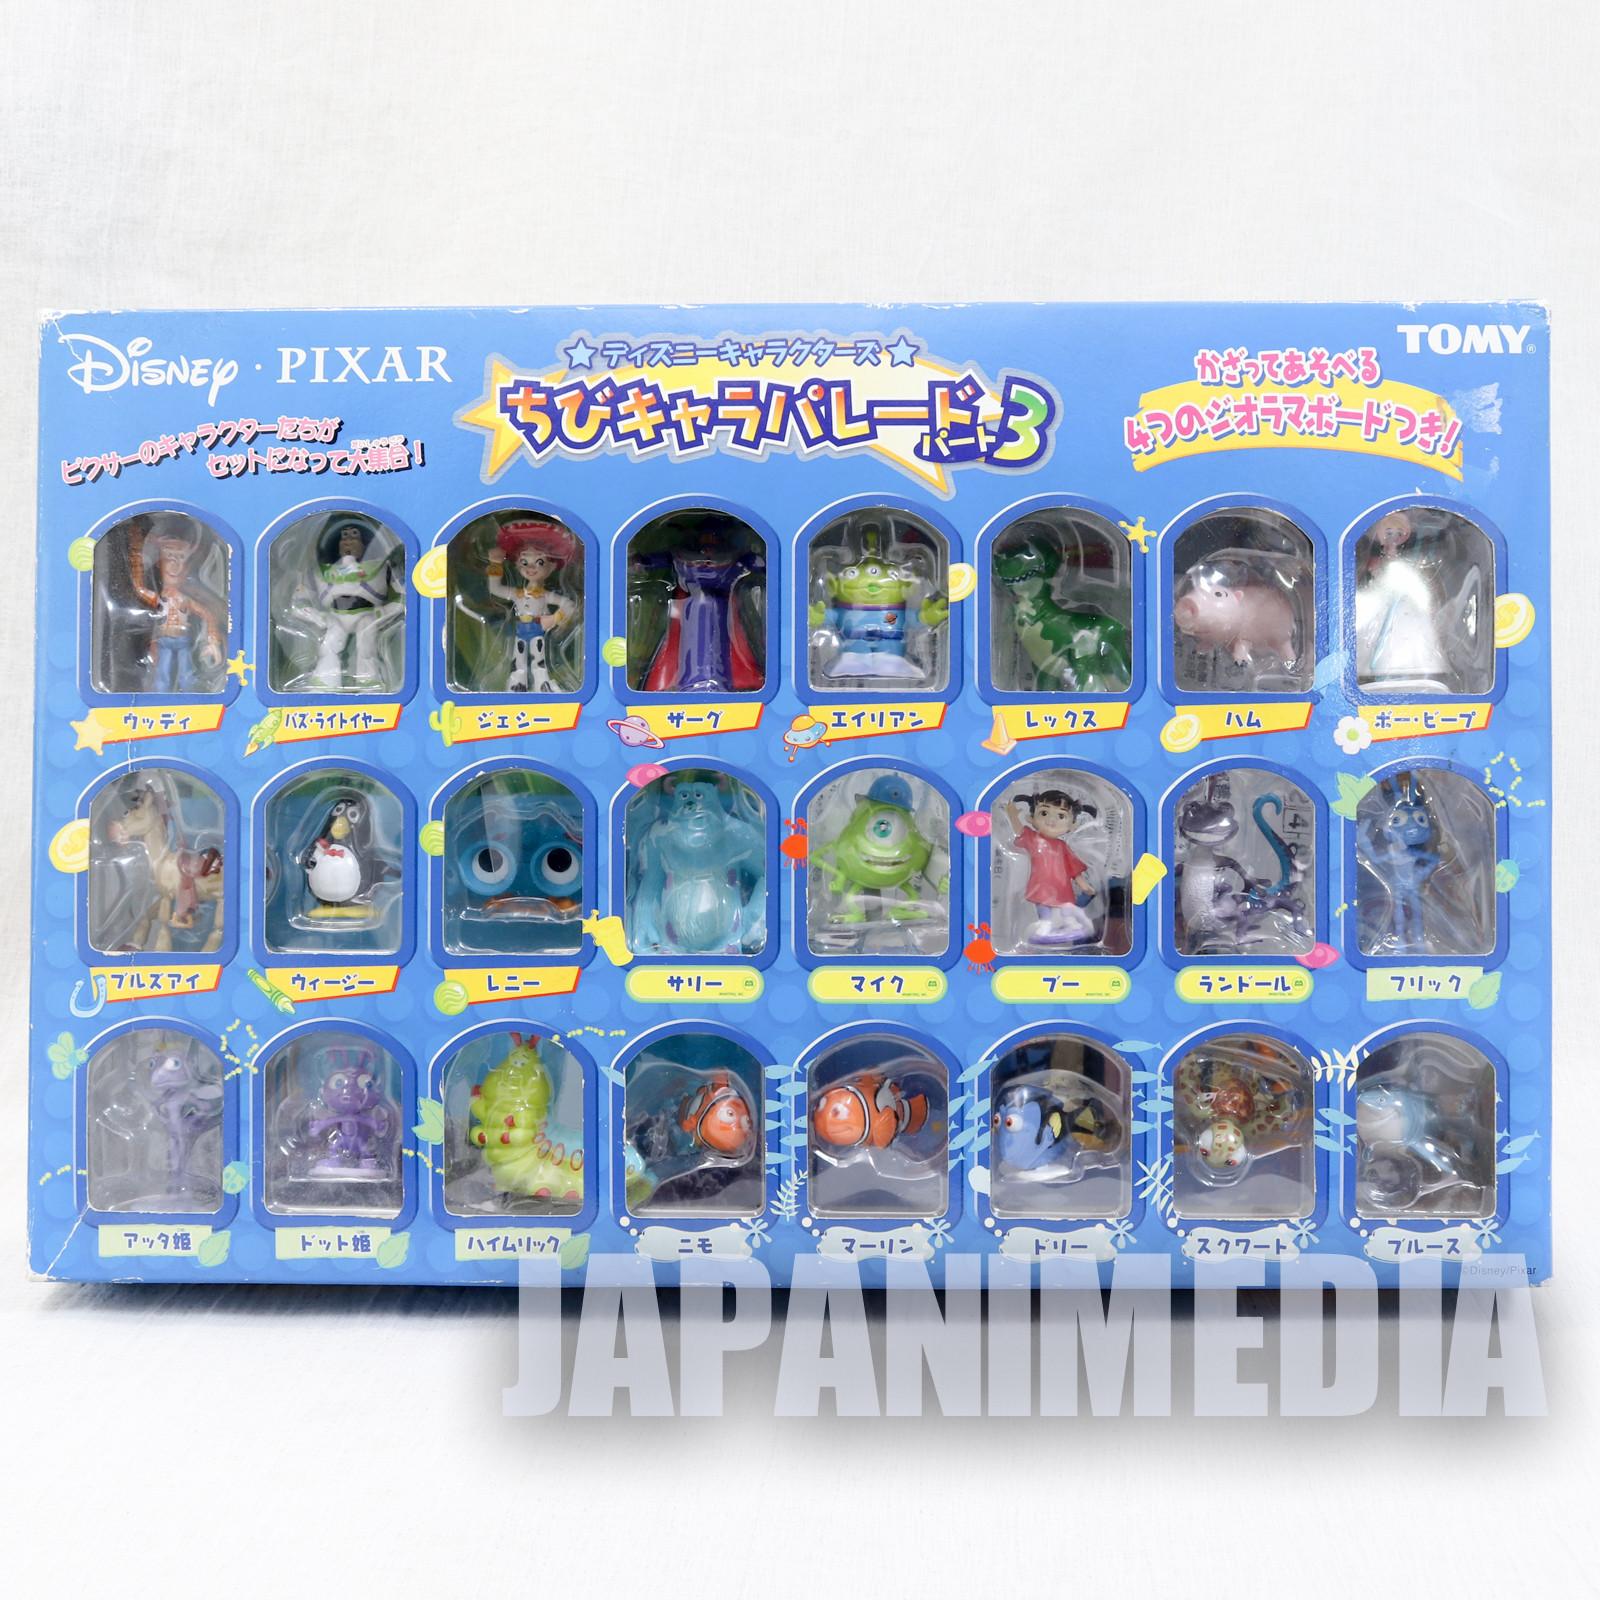 Disney Characters Chibi Chara Parade Vol.3 Mascot Figure 24pc set Tomy JAPAN